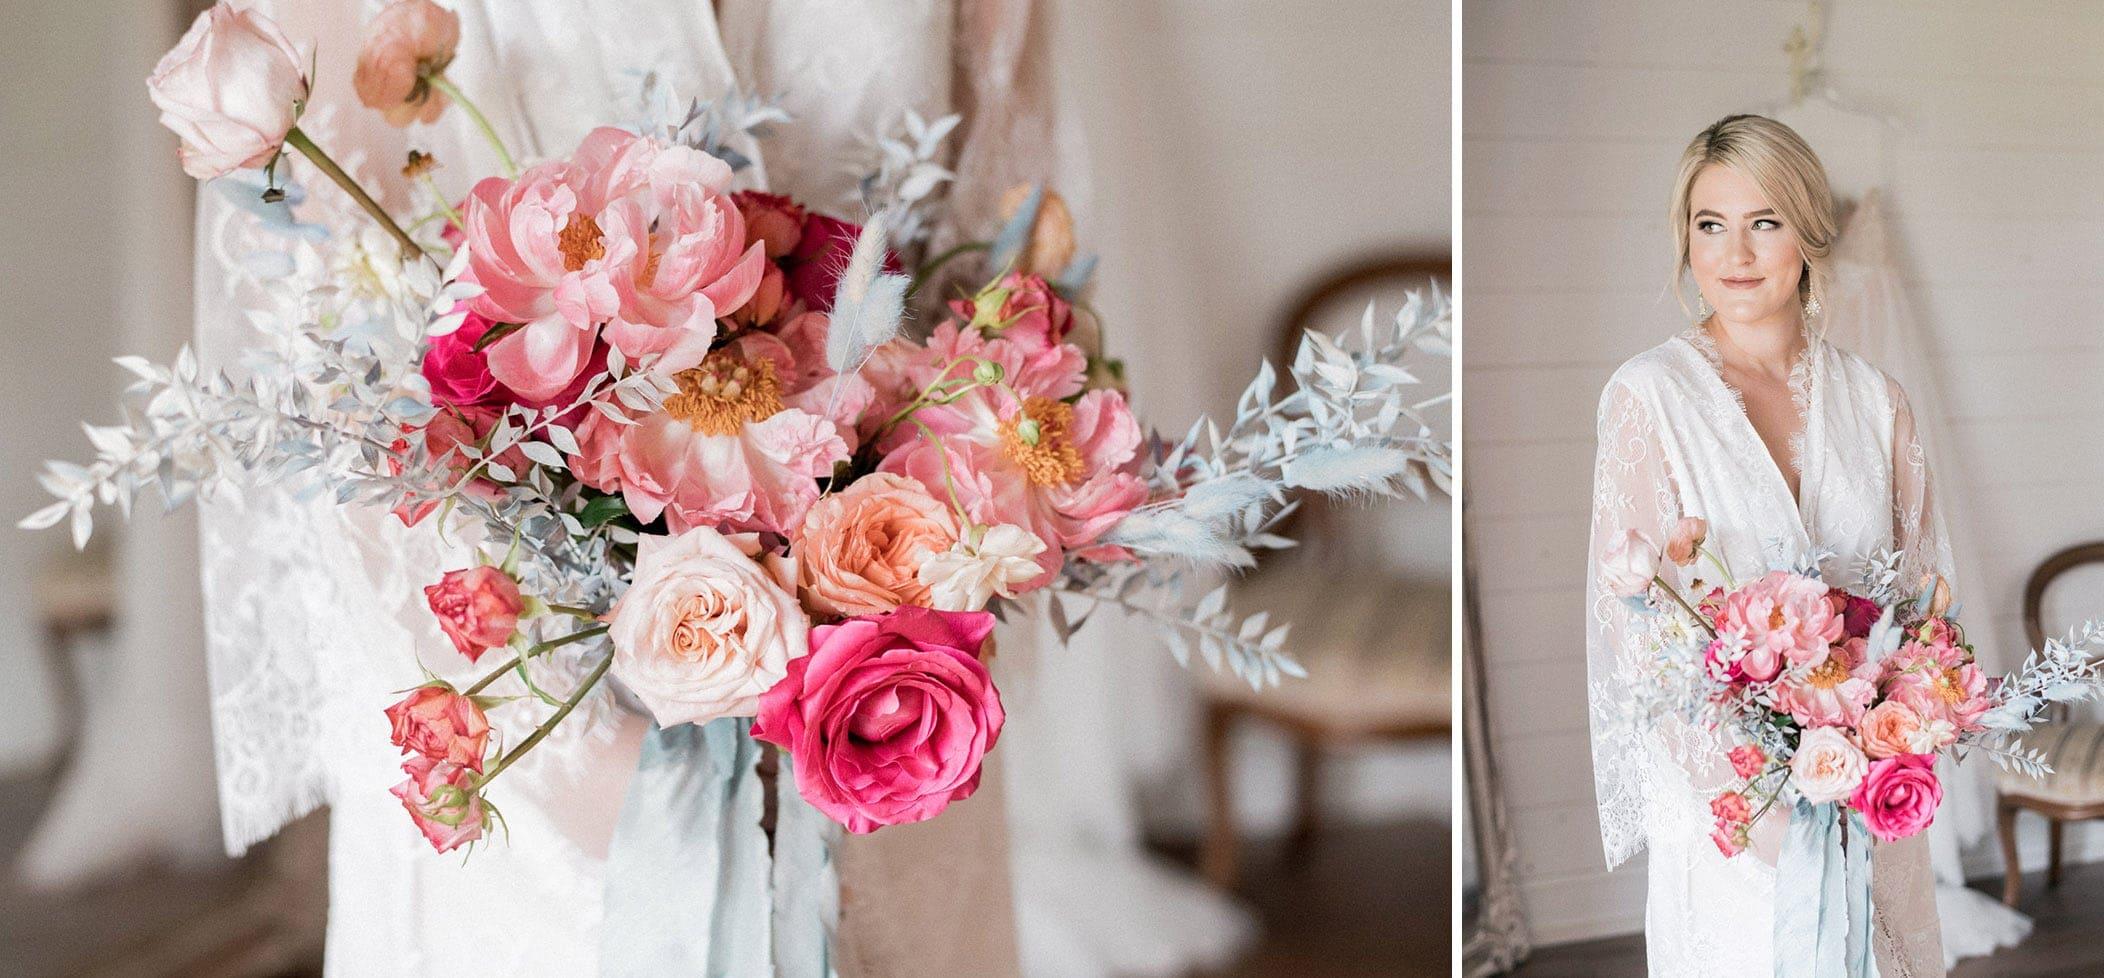 shelly sarver designs florals